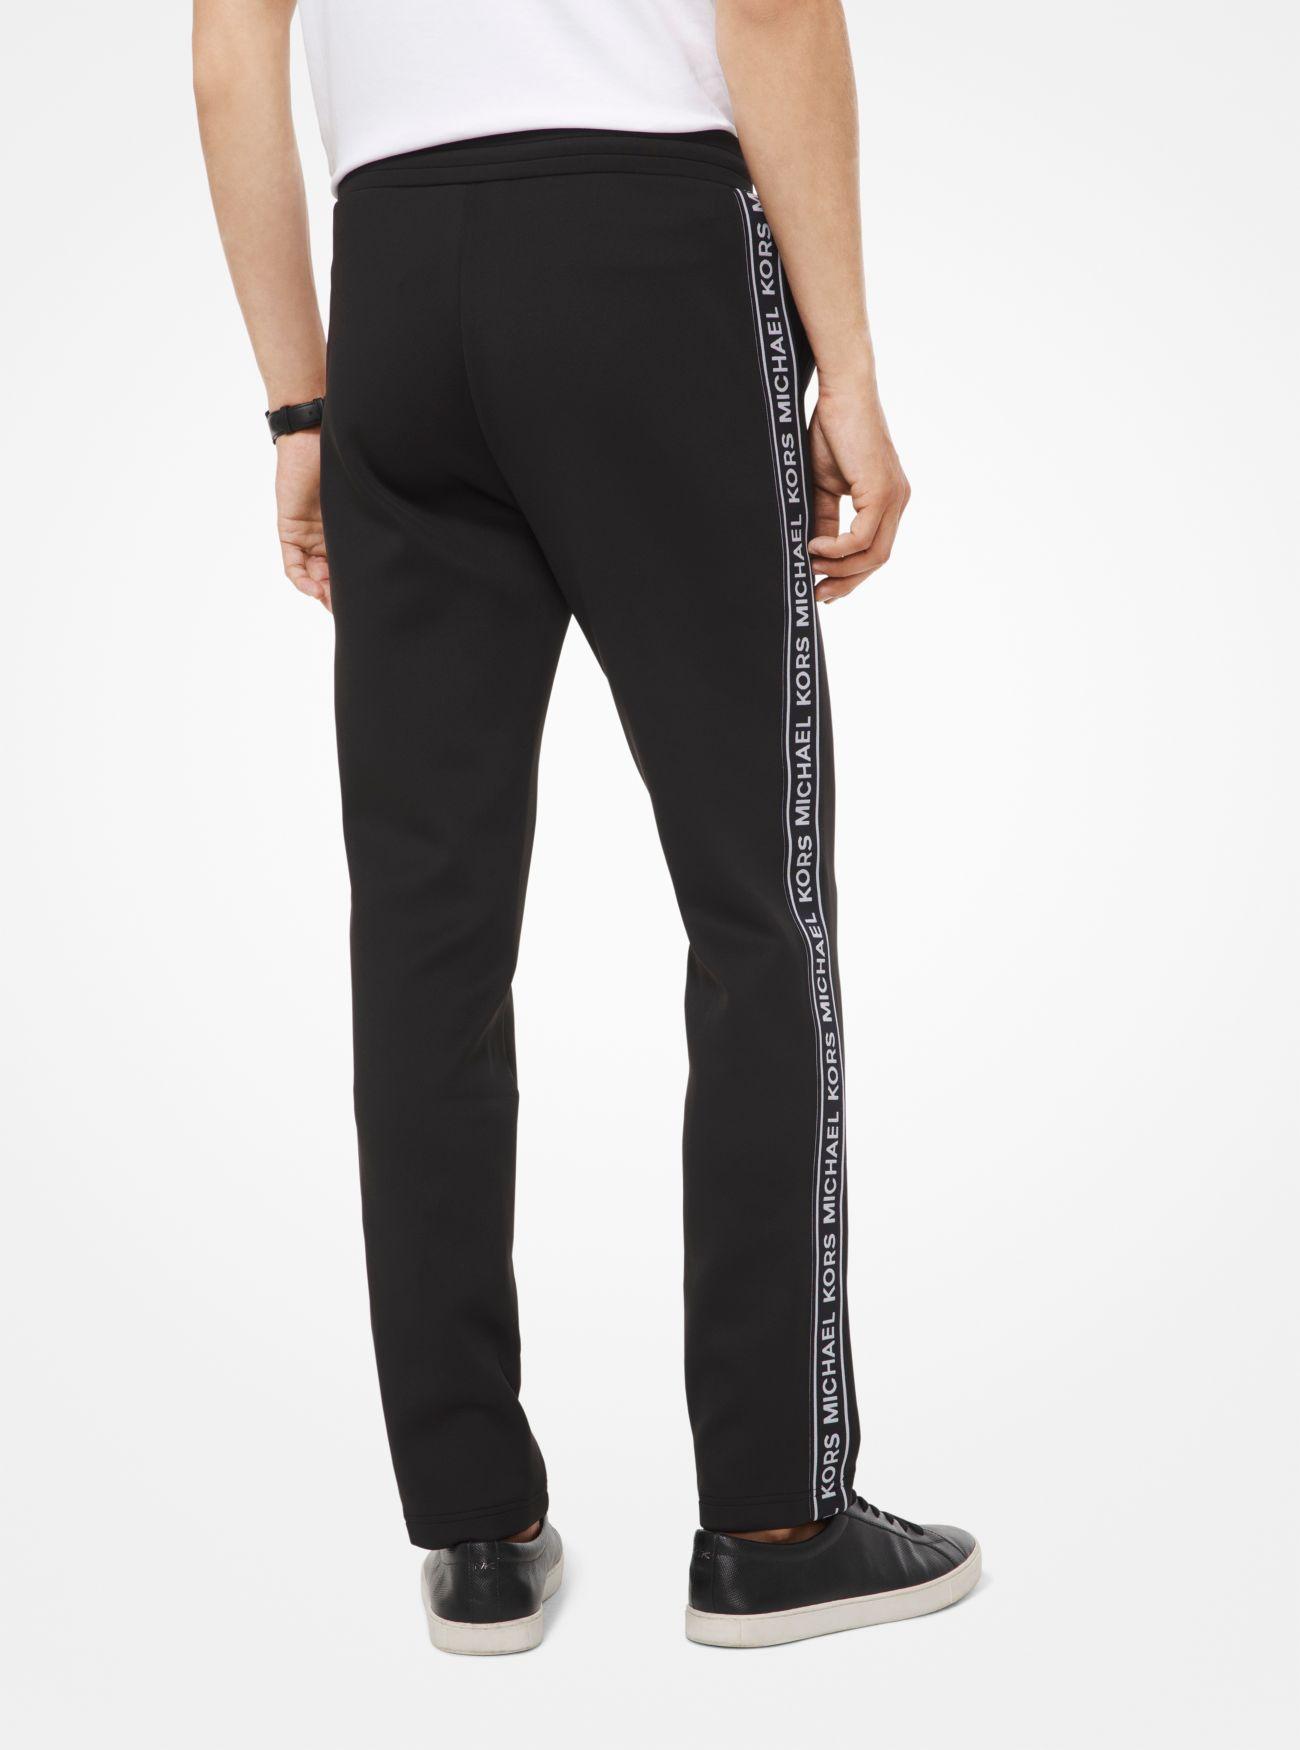 Pantalón deportivo de neopreno con logotipo Pantalón deportivo de neopreno  con logotipo b5b8d6b9088c